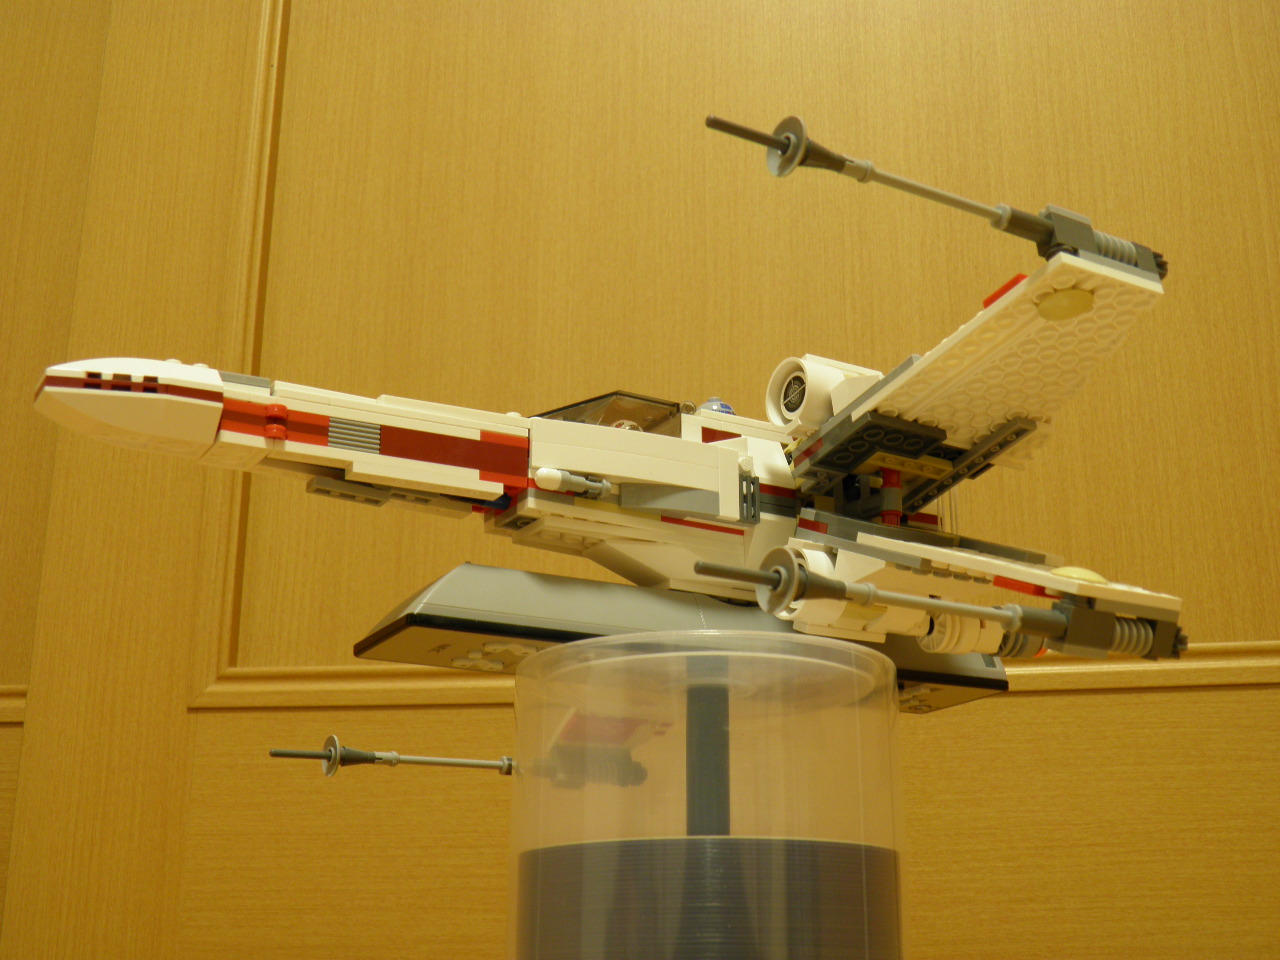 Xウイング ファイター レビュー. LEGO Xwing 018